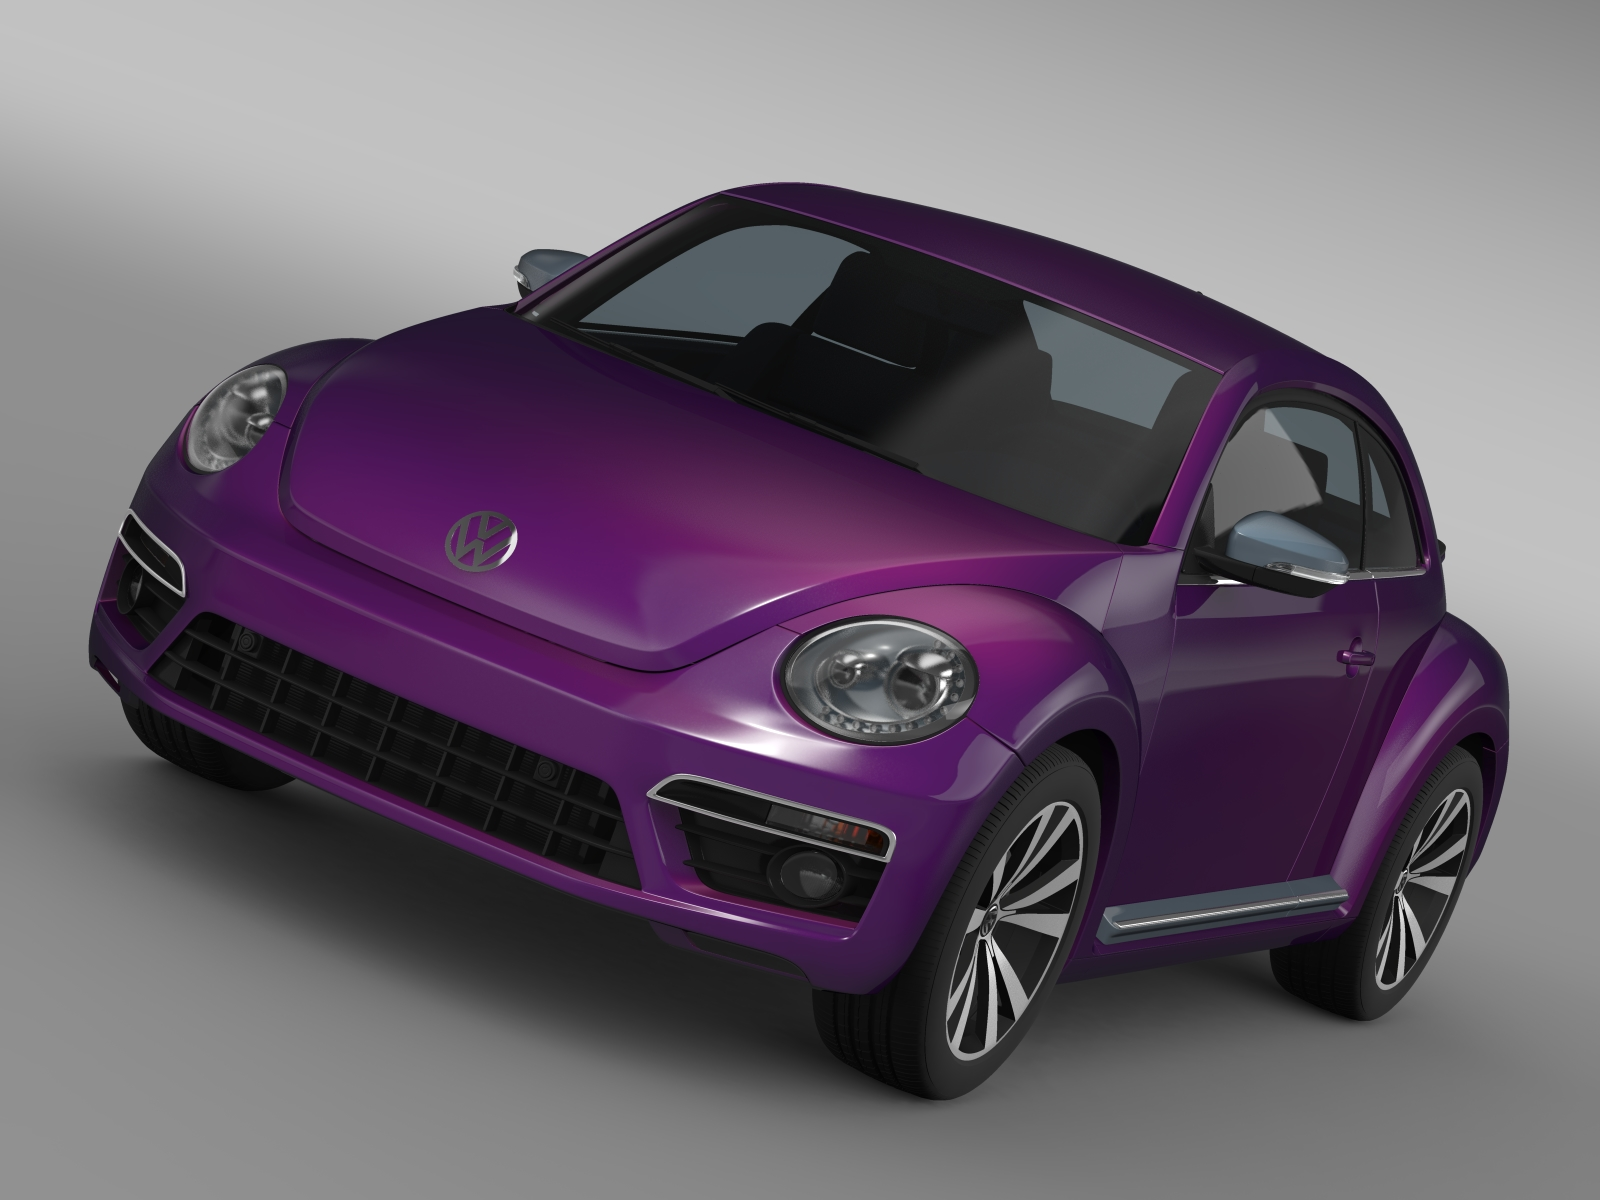 vw beetle rozā izdevuma koncepcija 2015 3d modelis 3ds max fbx c4d lwo ma mb hrc xsi obj 208786